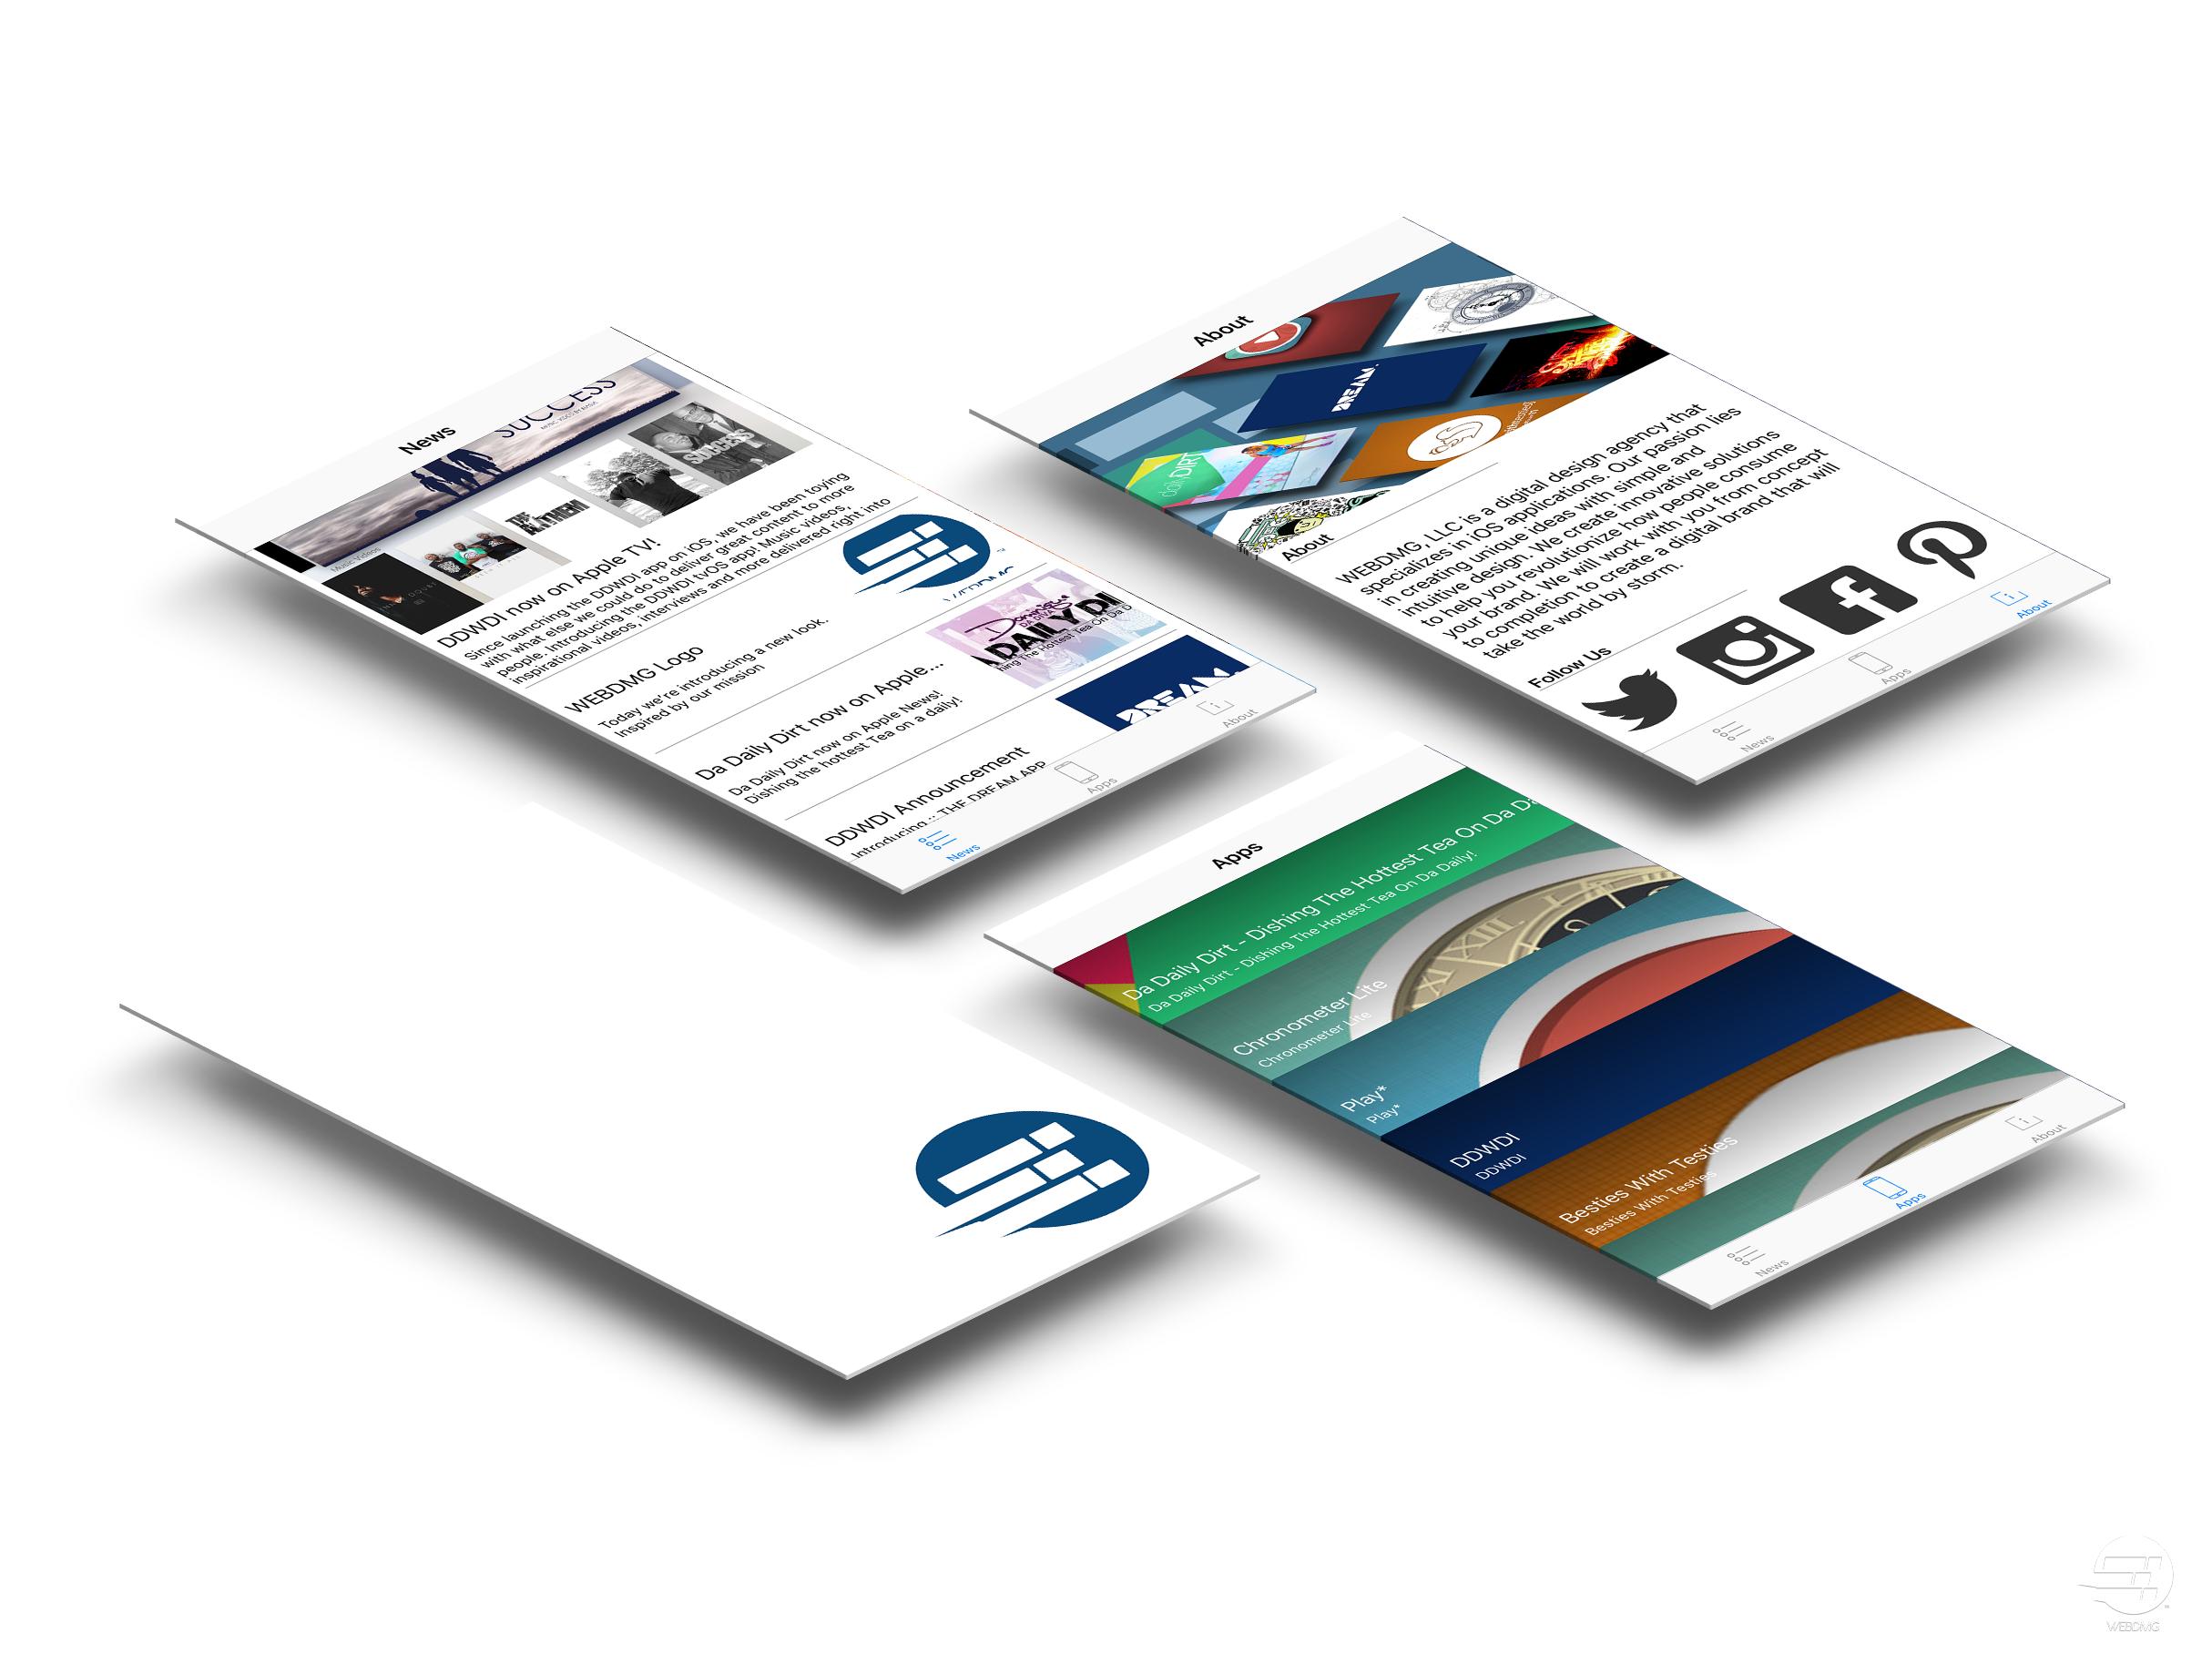 WEBDMG mobile app promo image.